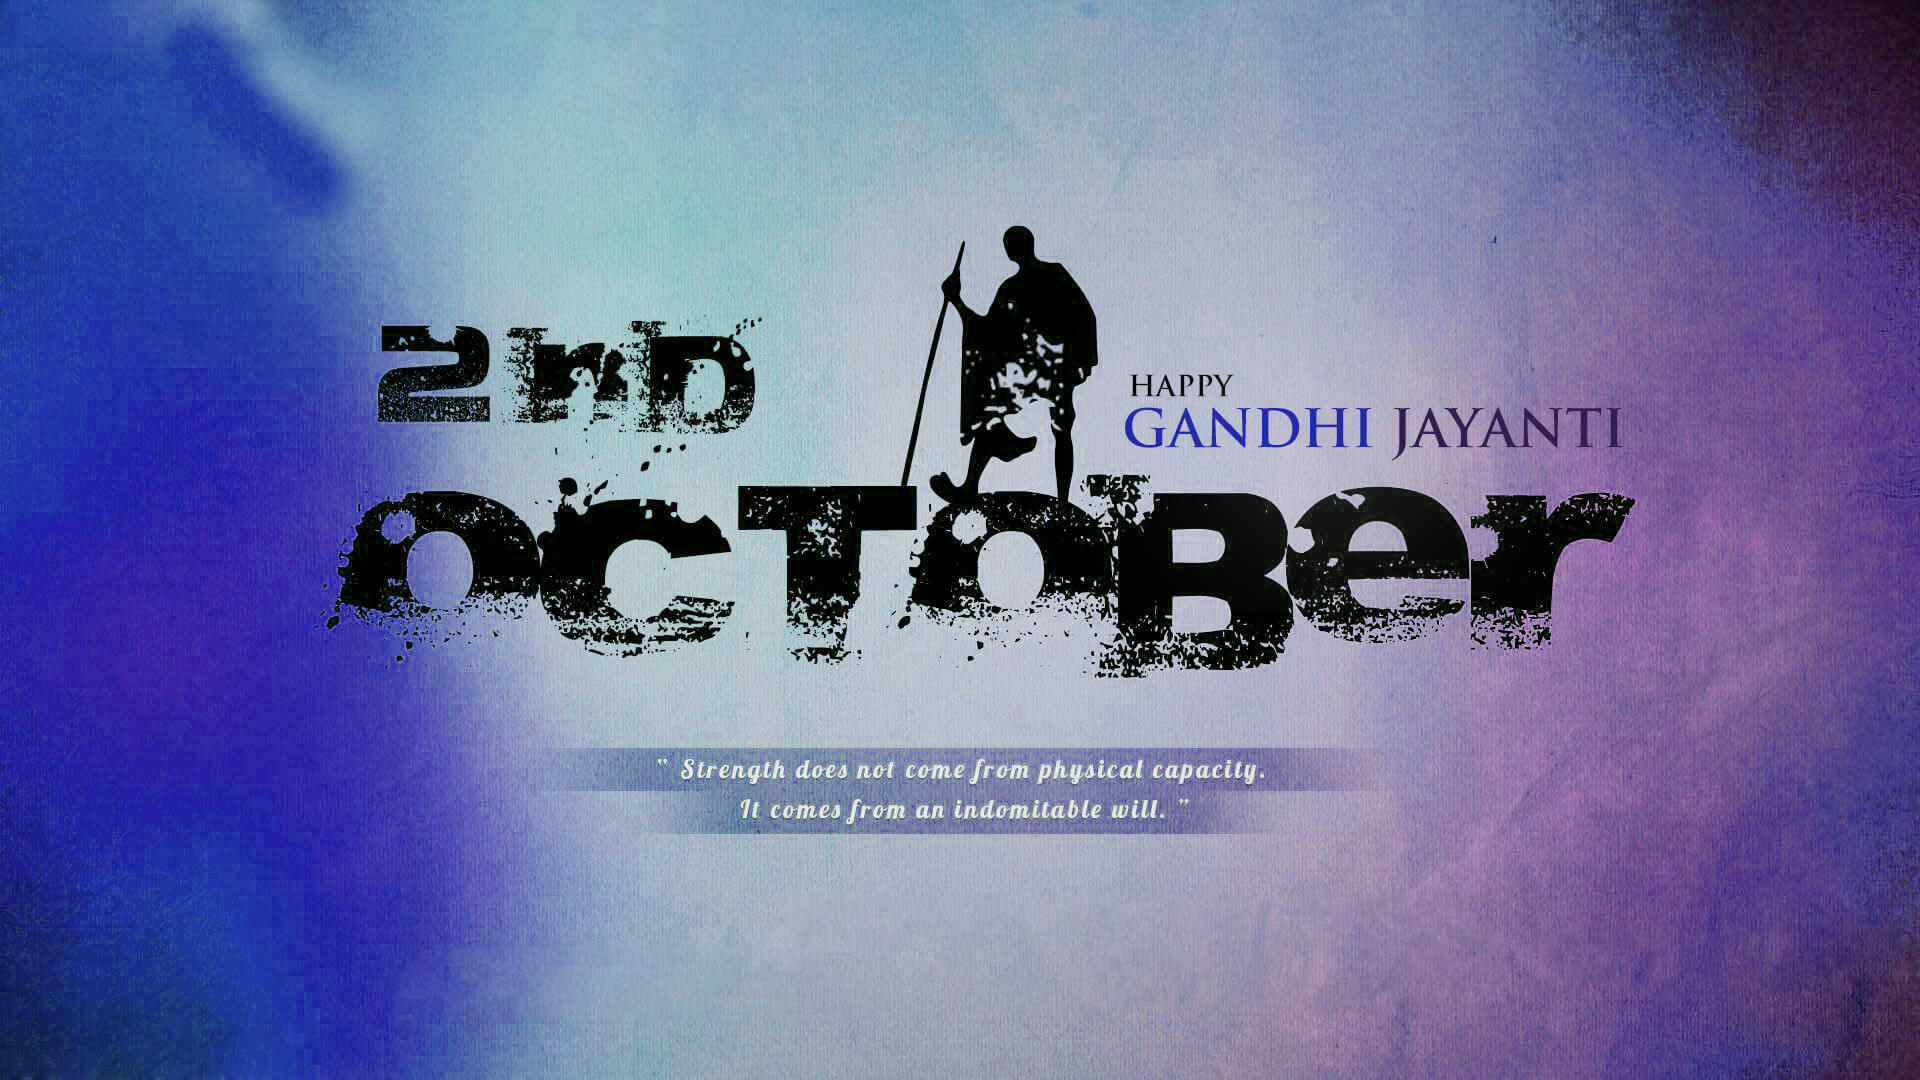 gandhi jayanti wishes october 2 new hd wallpaper